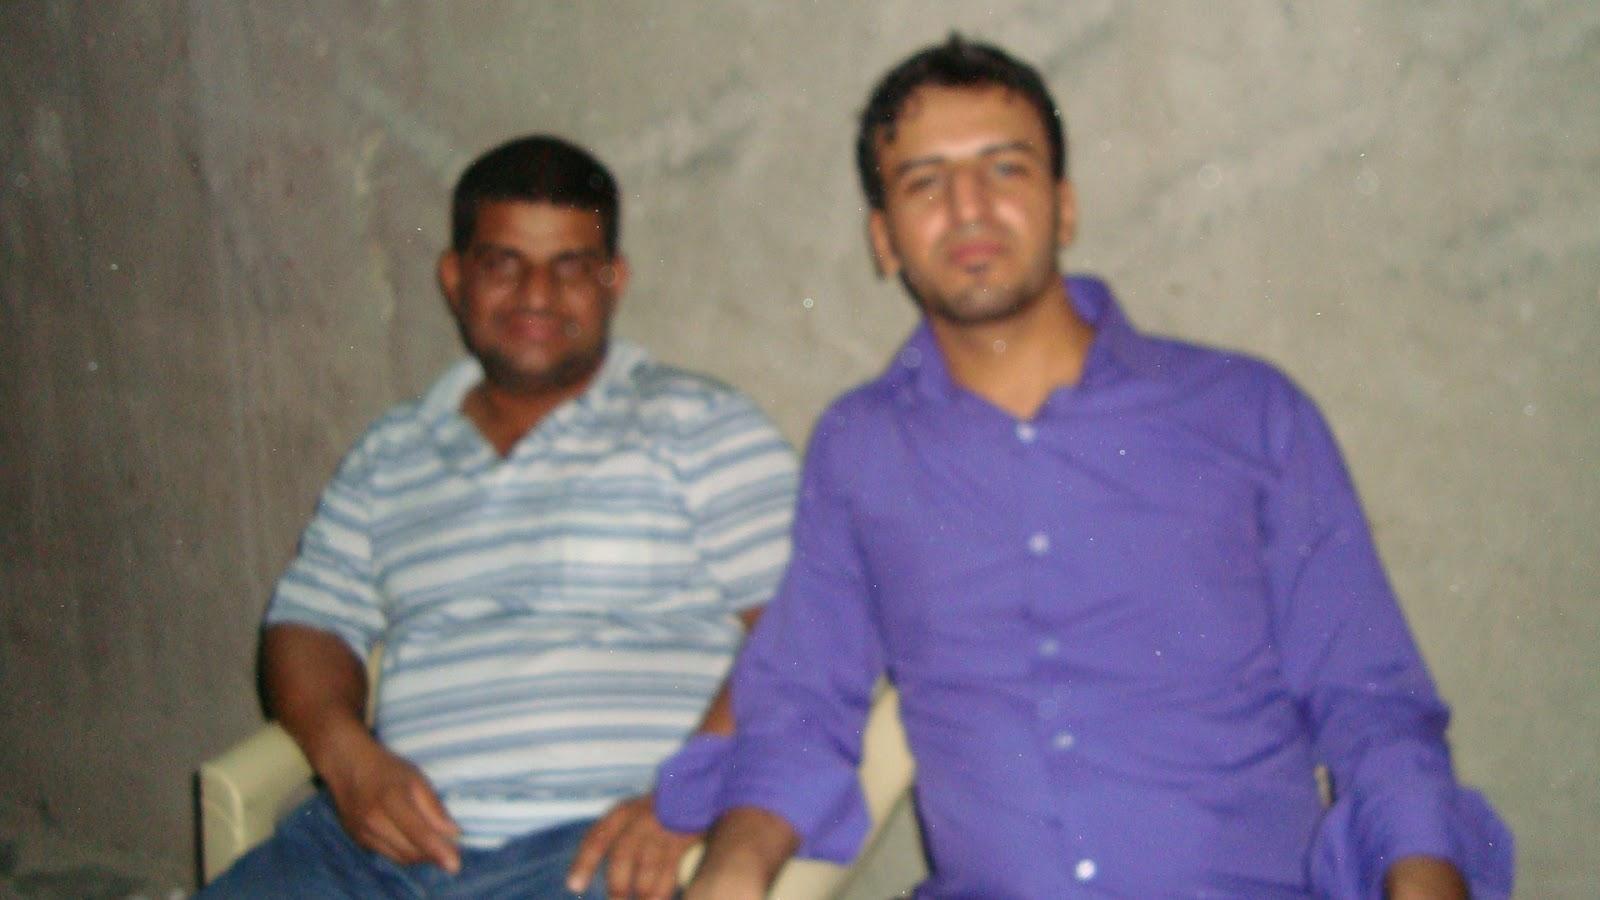 حسين الدراجي اولاد حسين الدراجي DSC00793